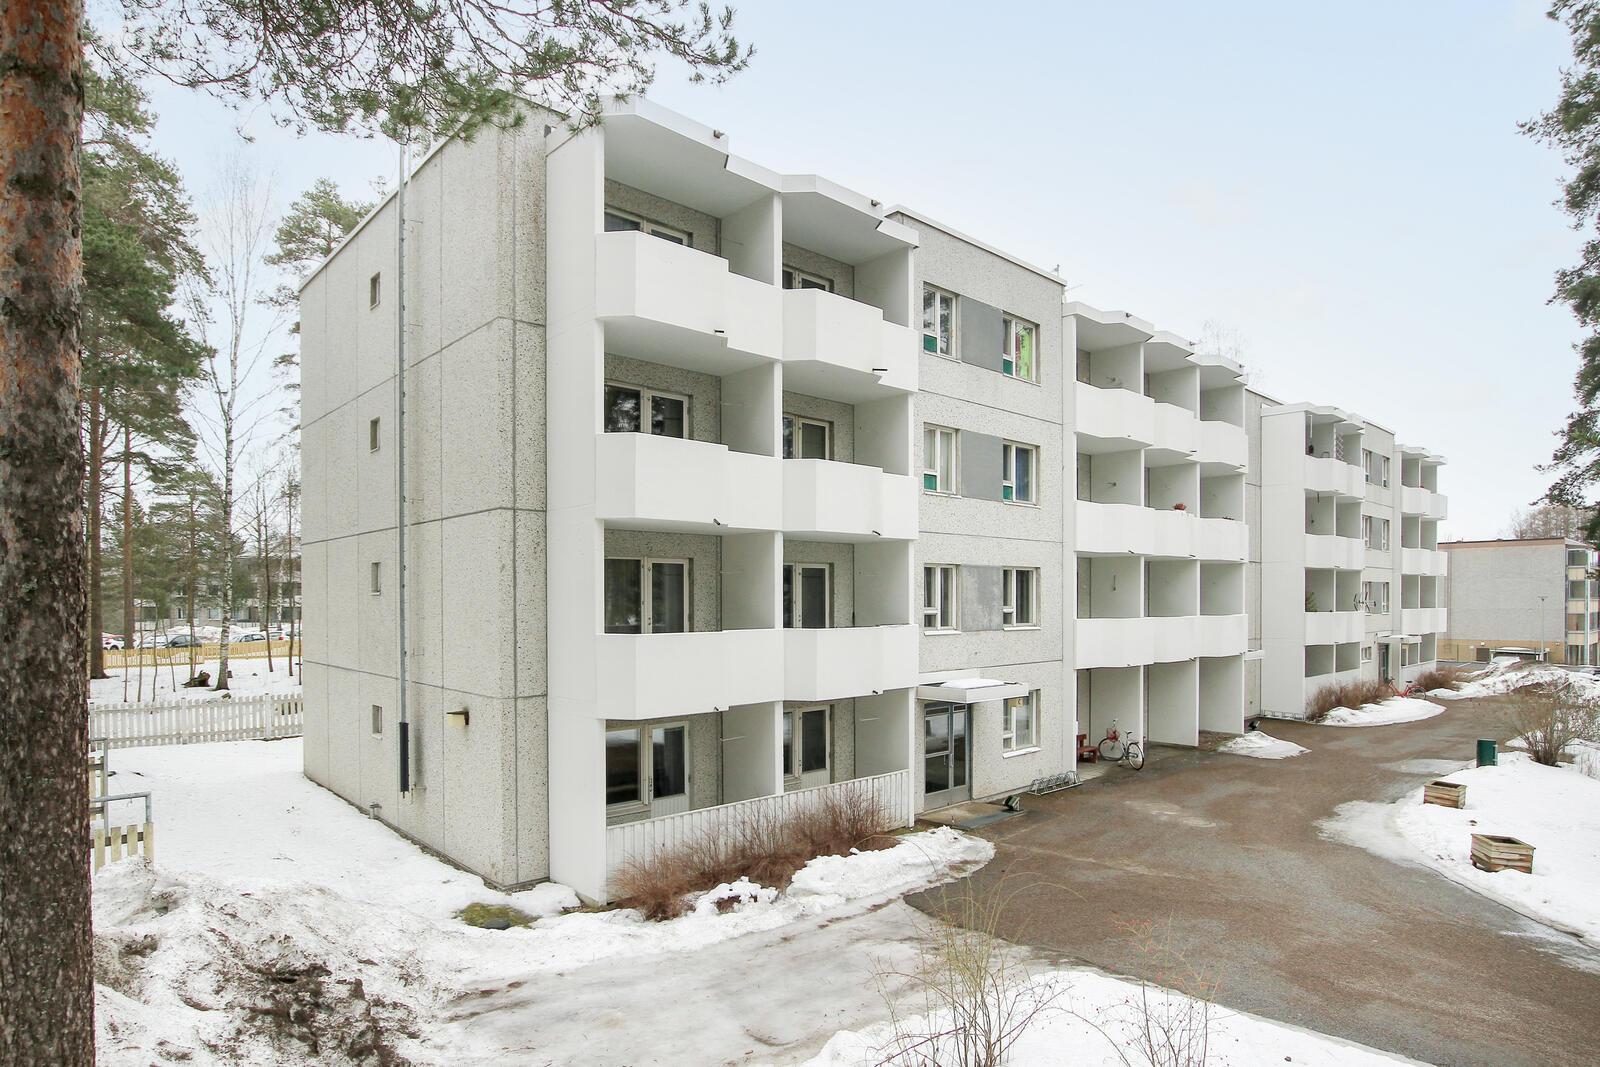 Skinnarila, Lappeenranta